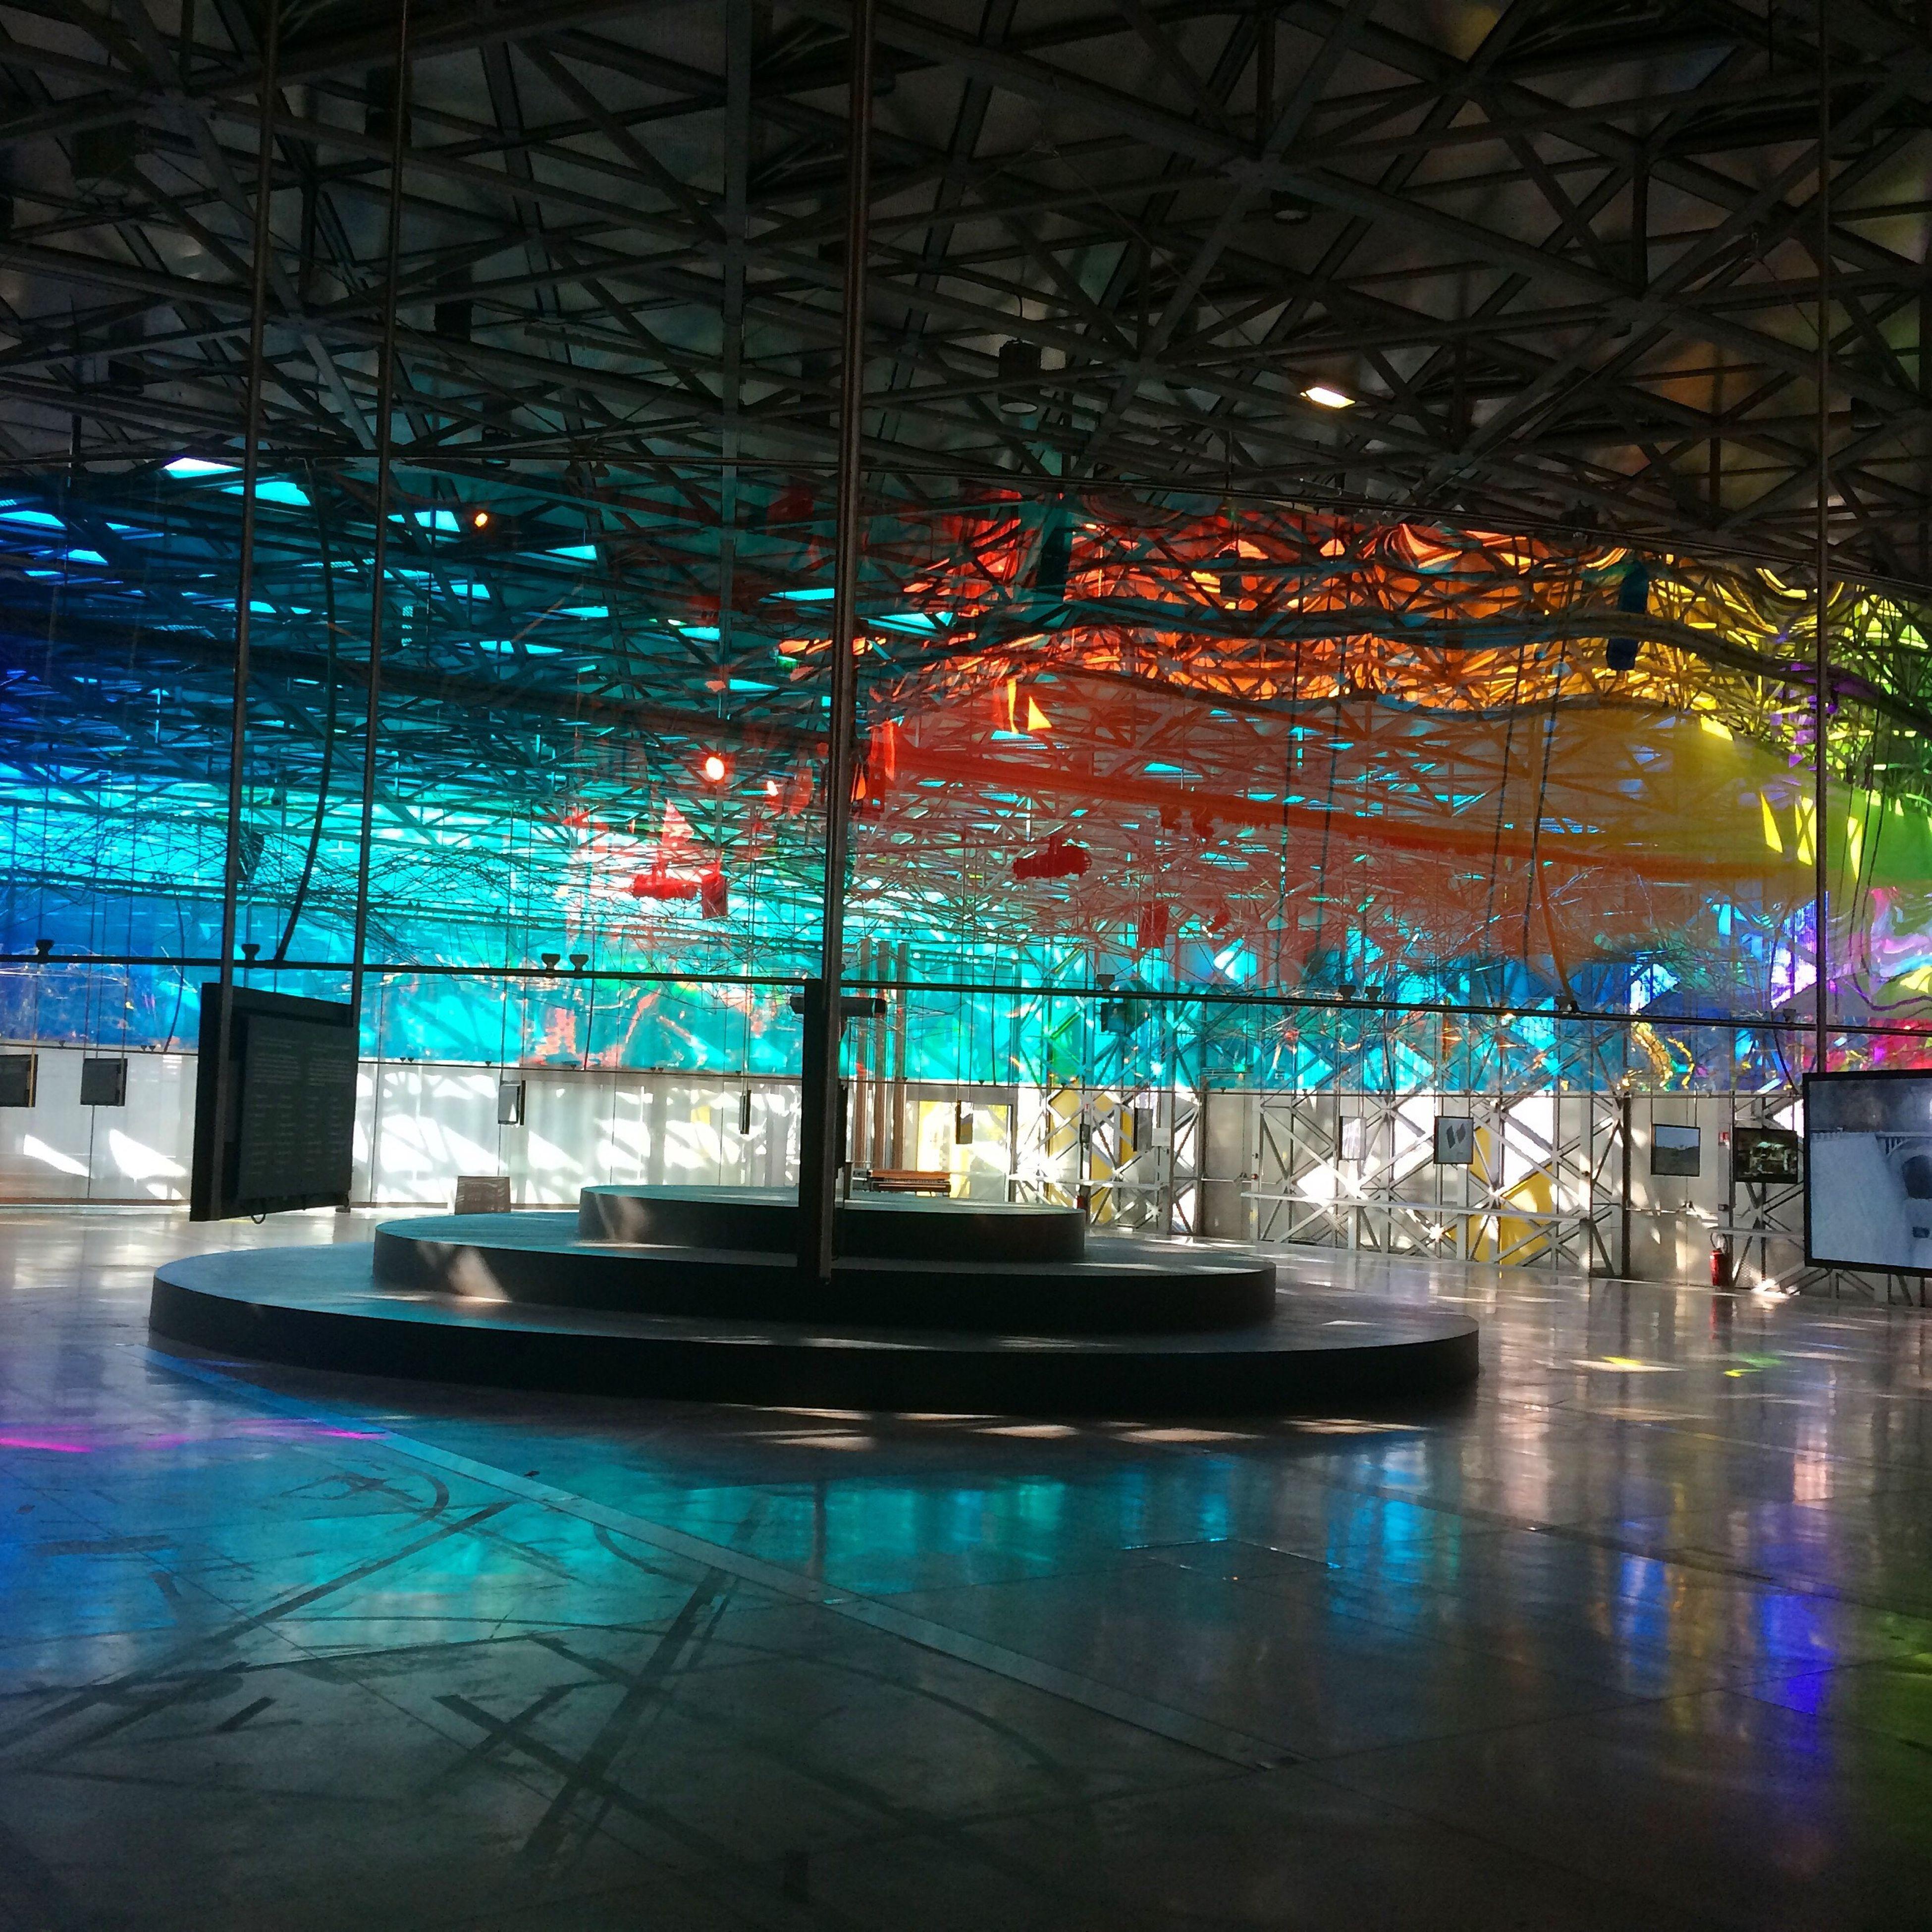 Illuminated Indoors  Modern Design Biennaledesign17 Art Taking Photos Photography Photooftheday Check This Out EyeEm Best Shots